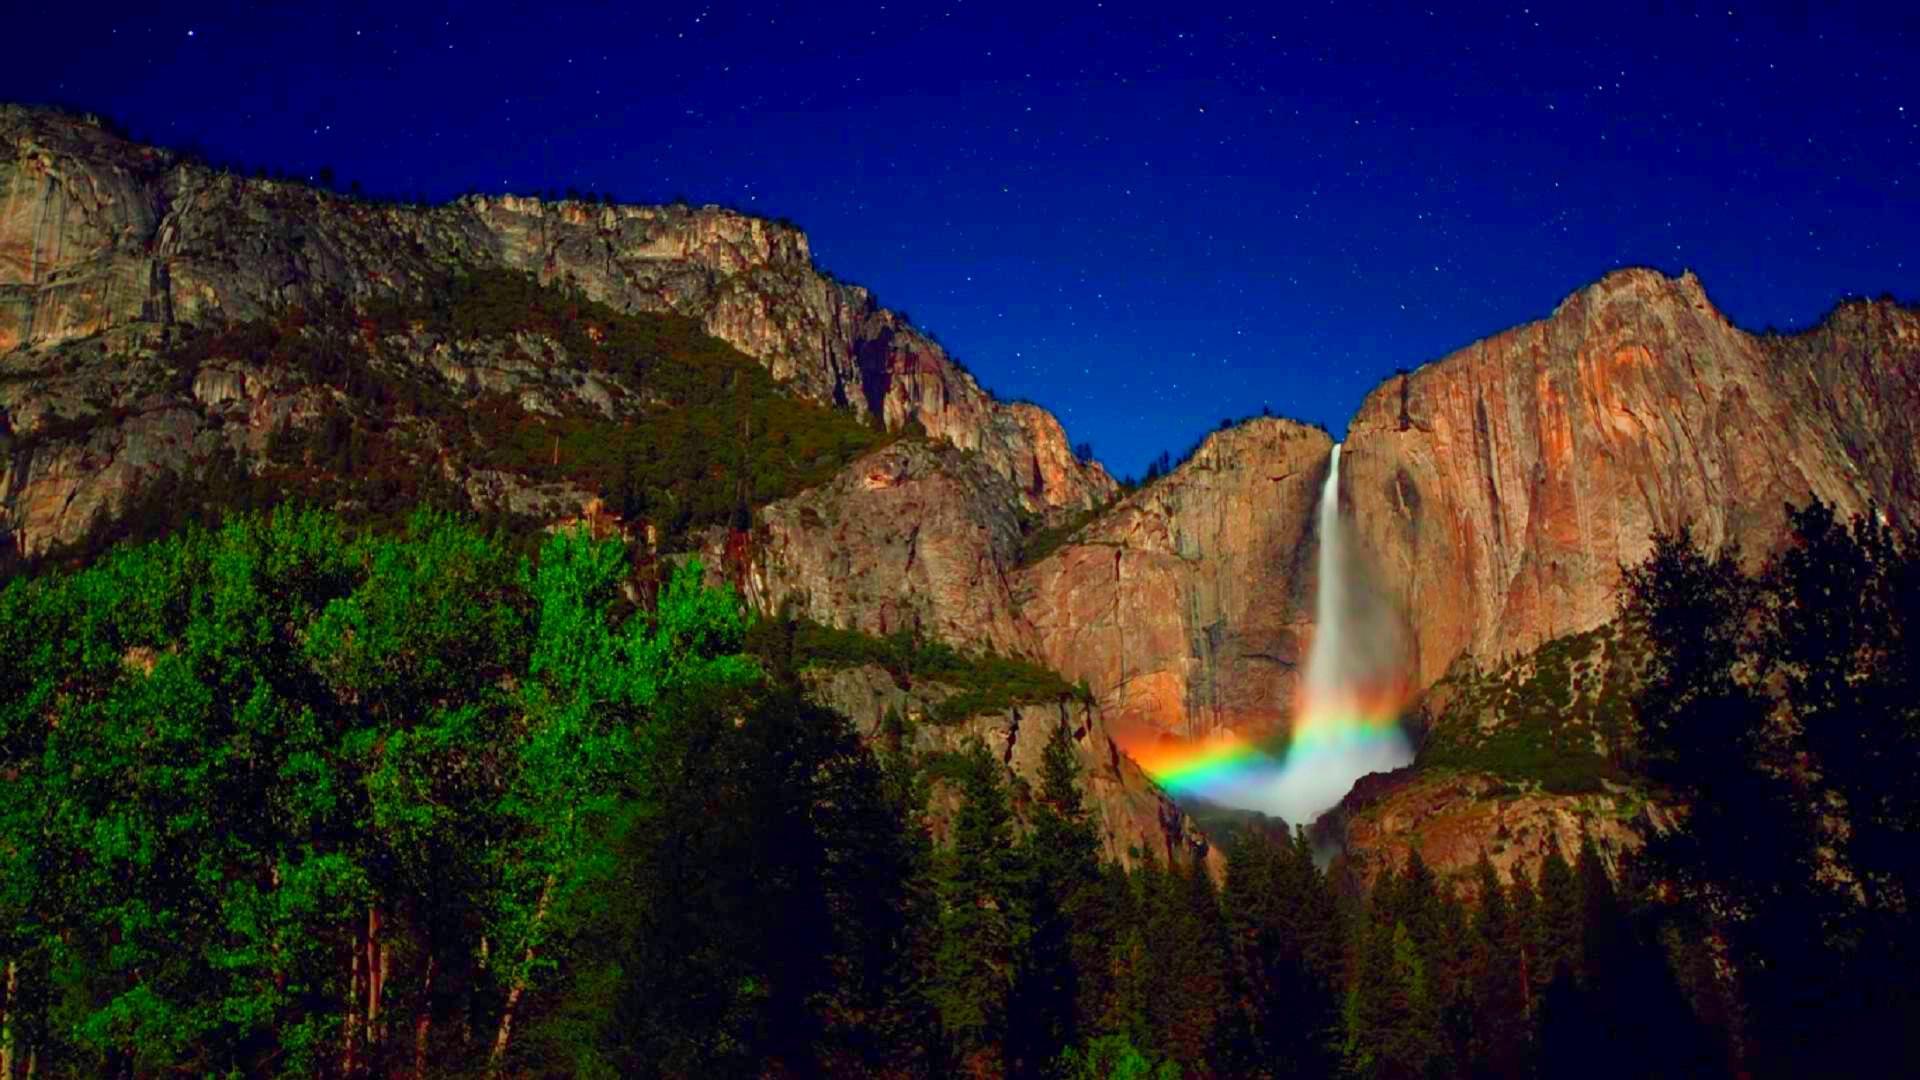 Niagara Falls Hd Wallpaper For Desktop Yosemite Night Wallpaper Pixelstalk Net